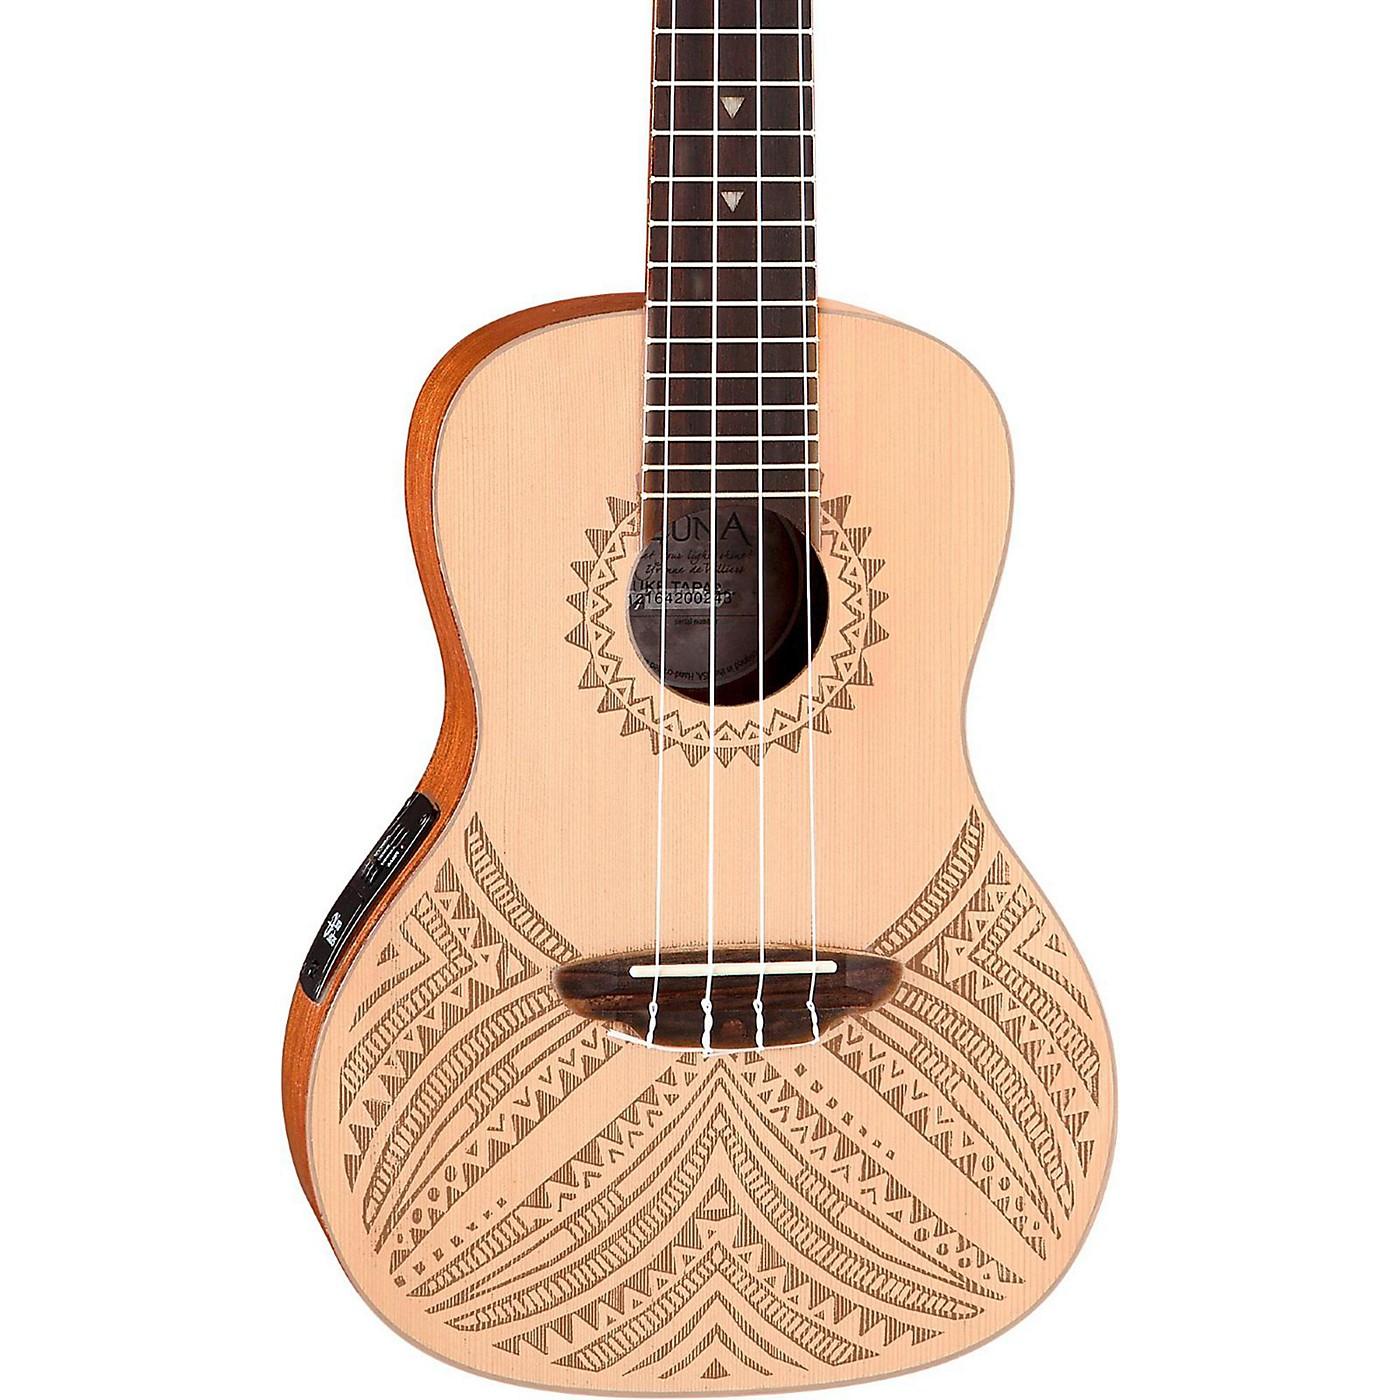 Luna Guitars Concert Solid Spruce Top Tapa Design Acoustic Electric Ukulele thumbnail